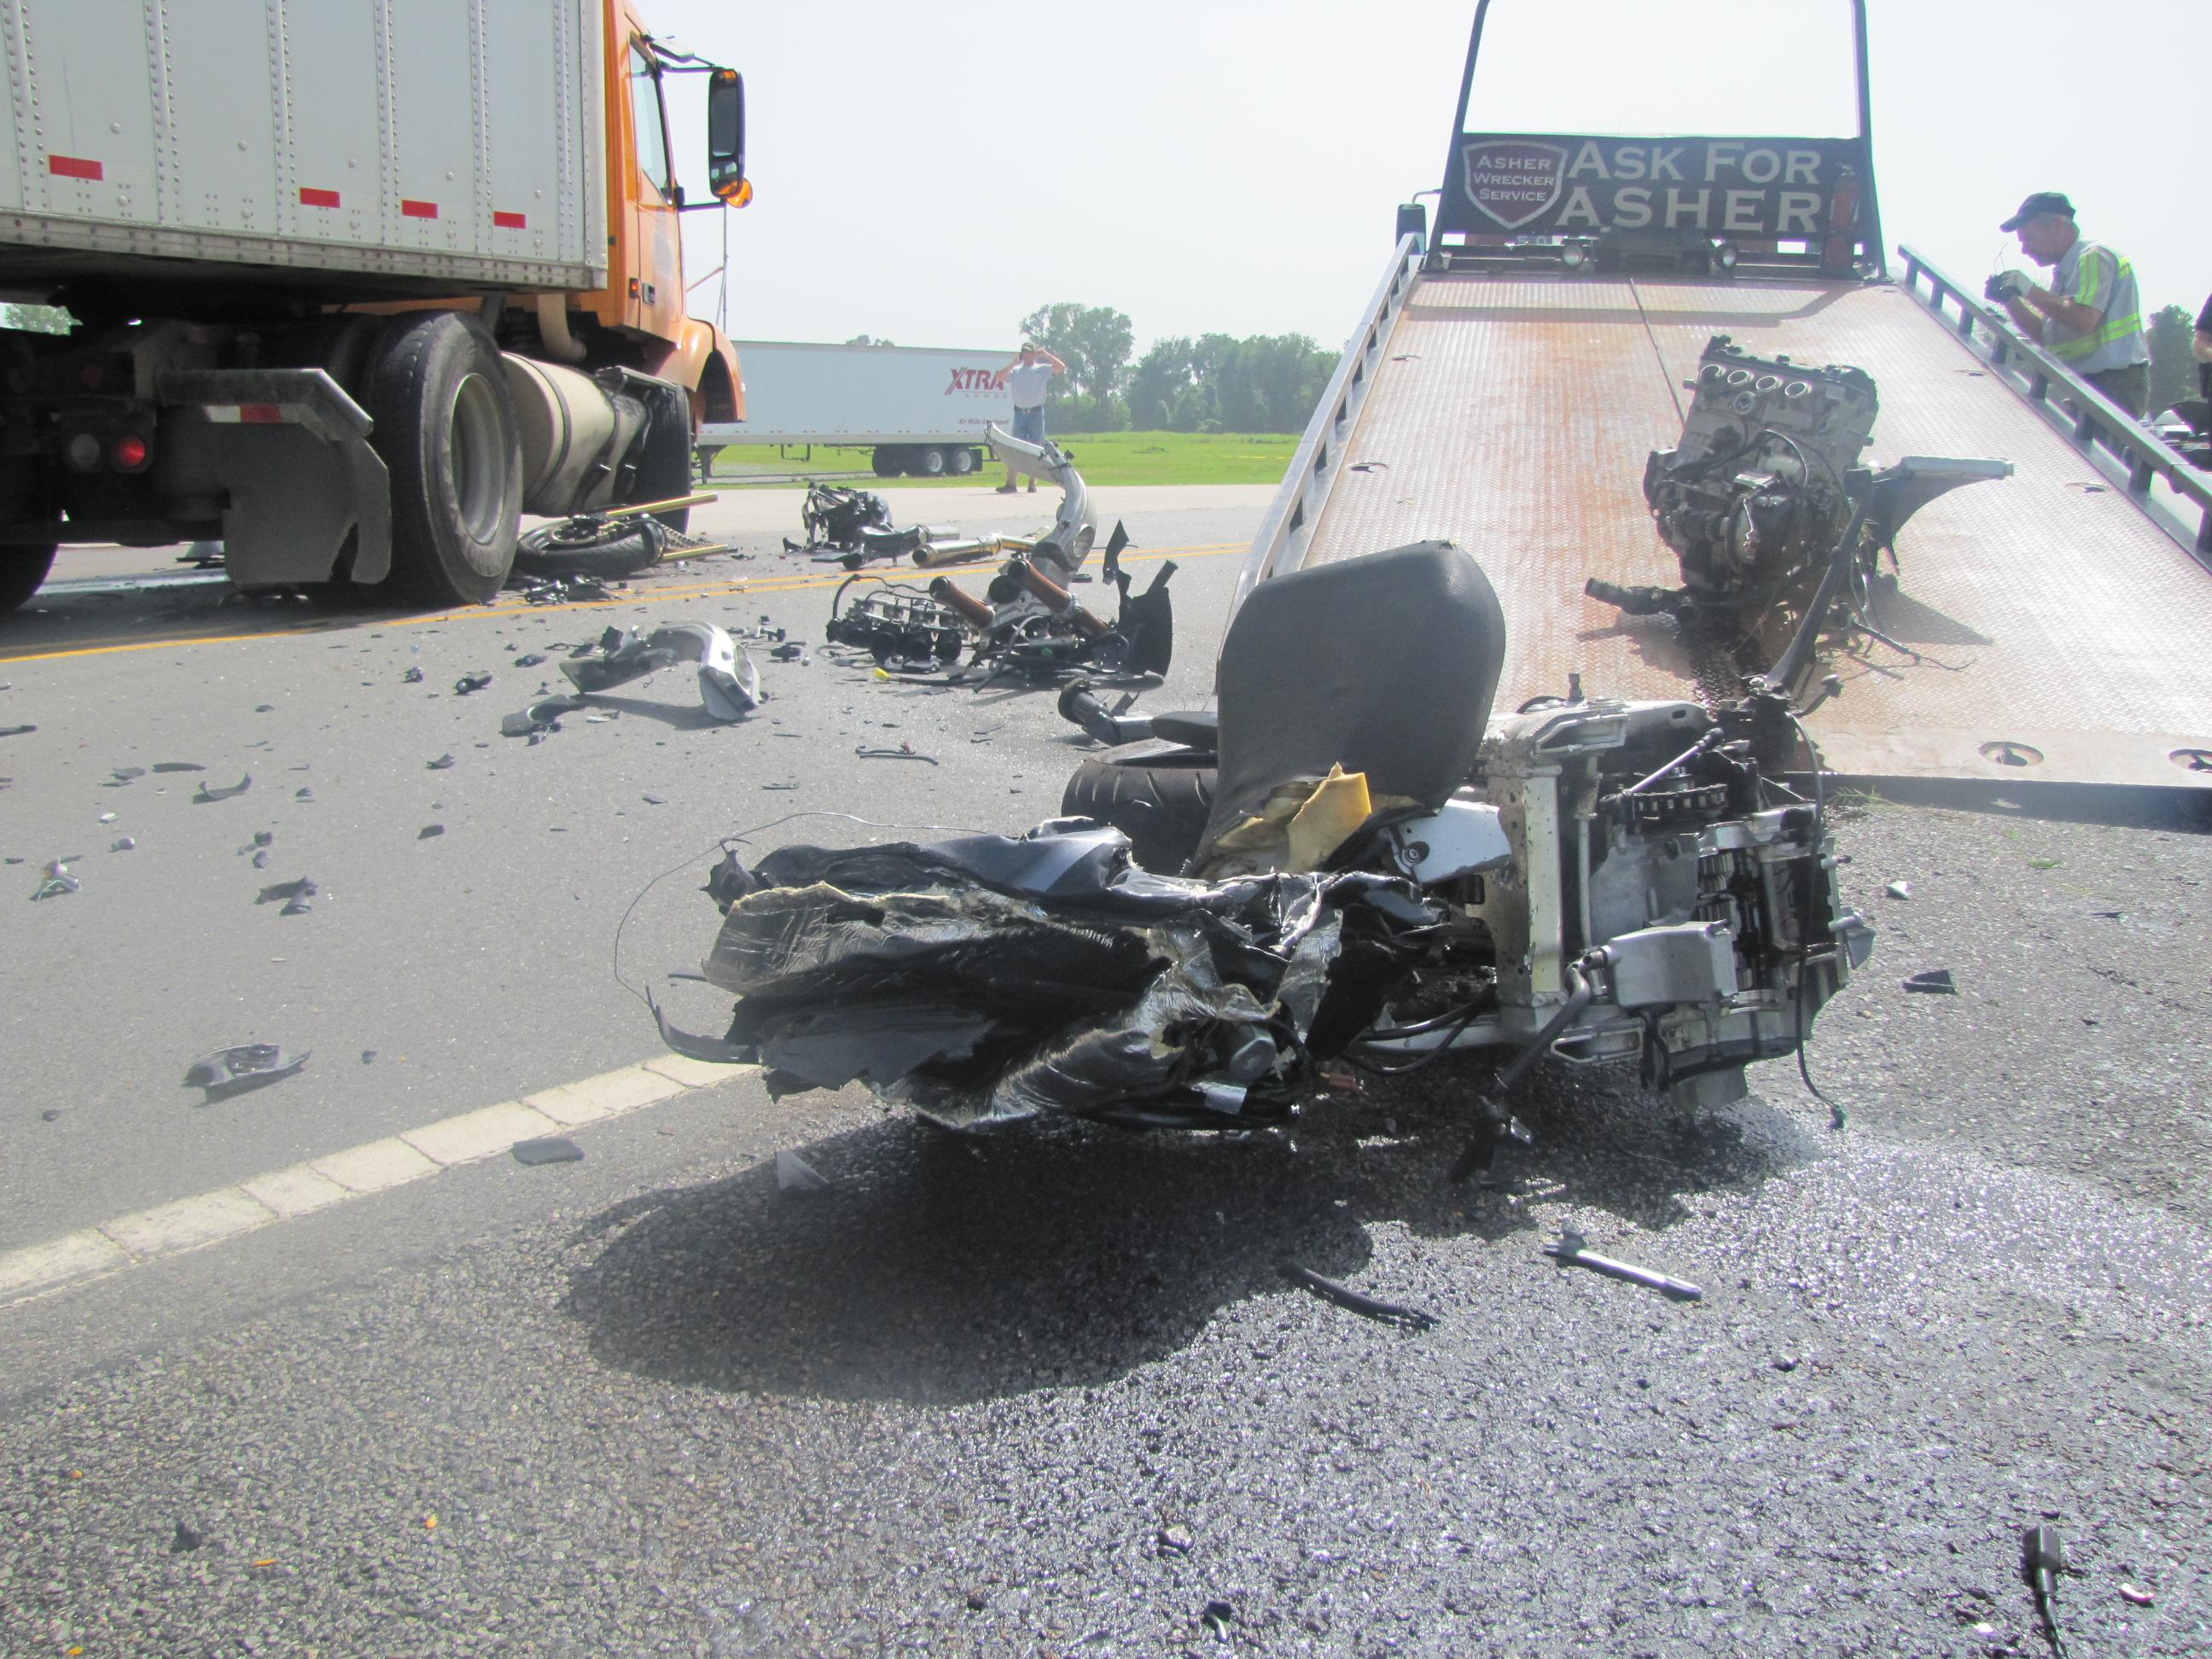 Armoured Vehicles Latin America ⁓ These Motorcycle Wrecks In Arkansas